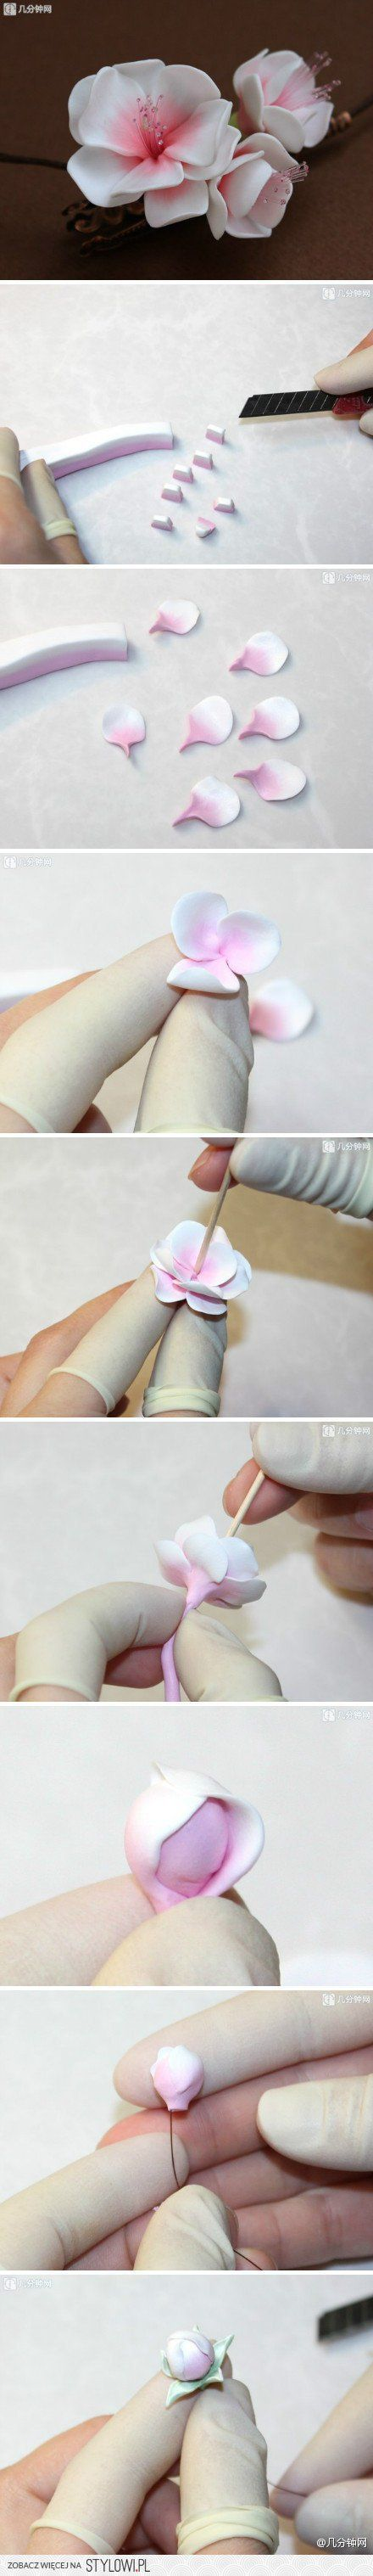 DIY Marshmallow Flower DIY Projects | UsefulDIY.com na Stylowi.pl